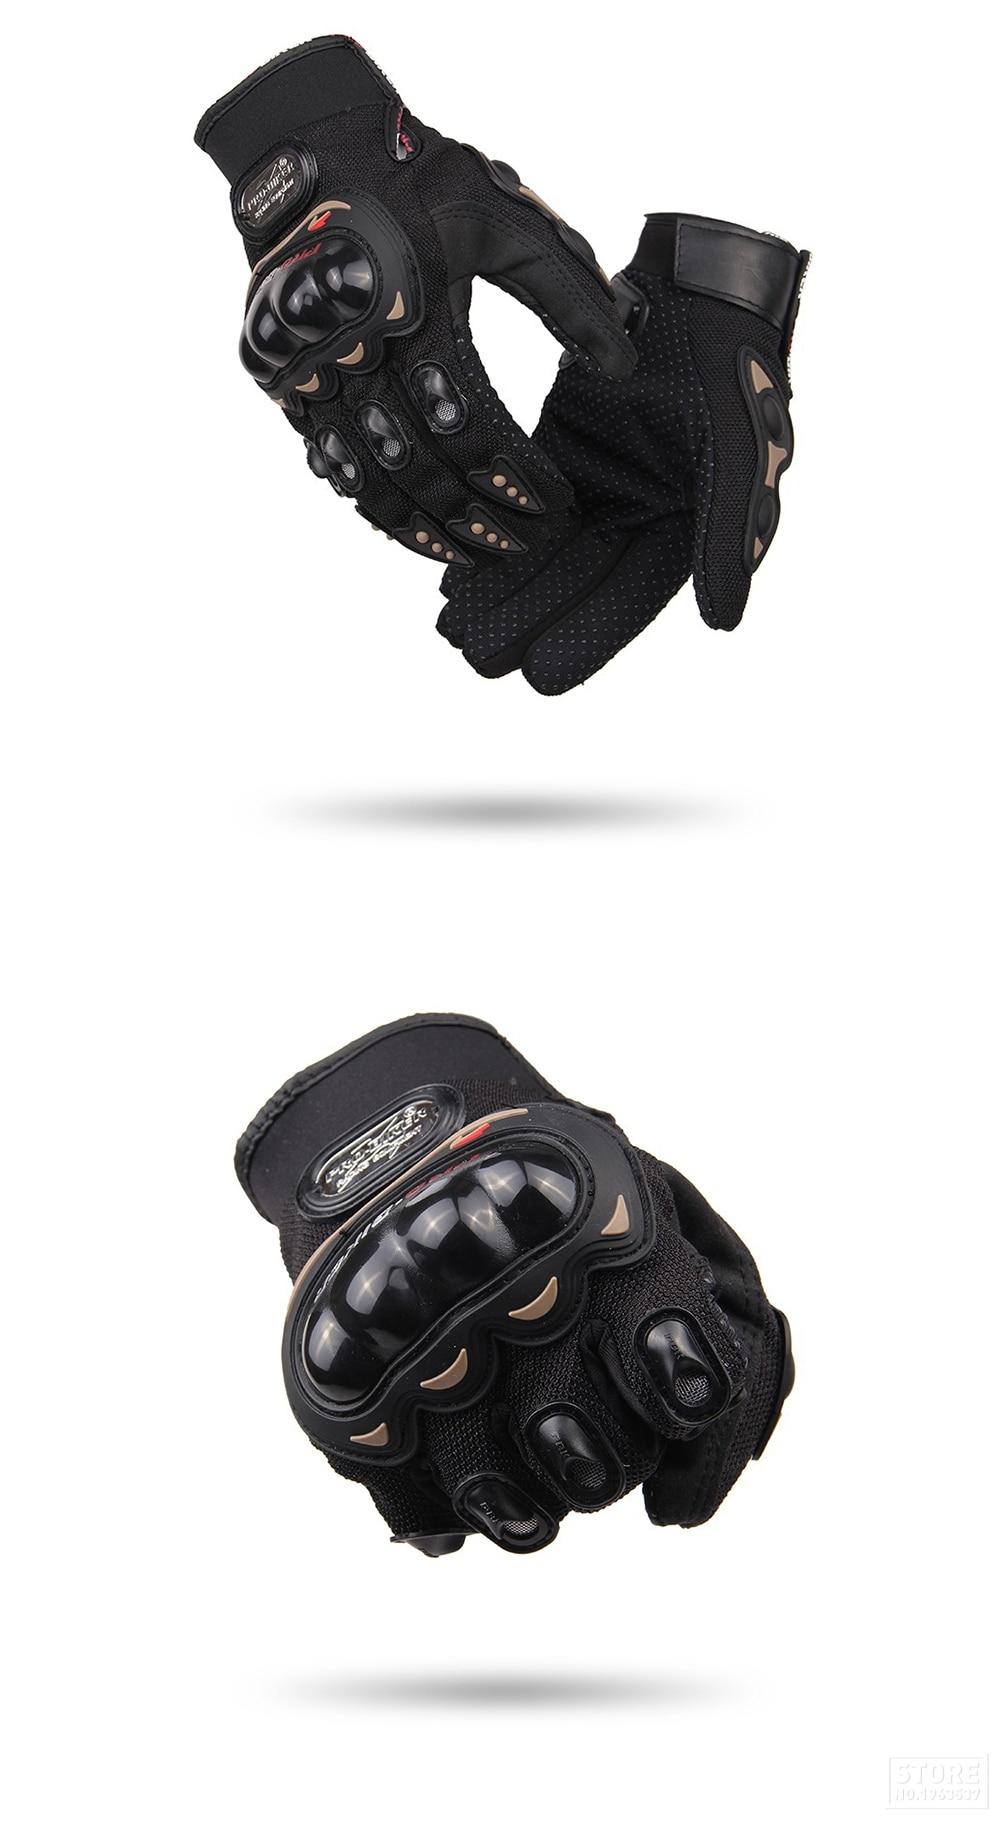 Gloves Pro-Biker Collection (22) 25